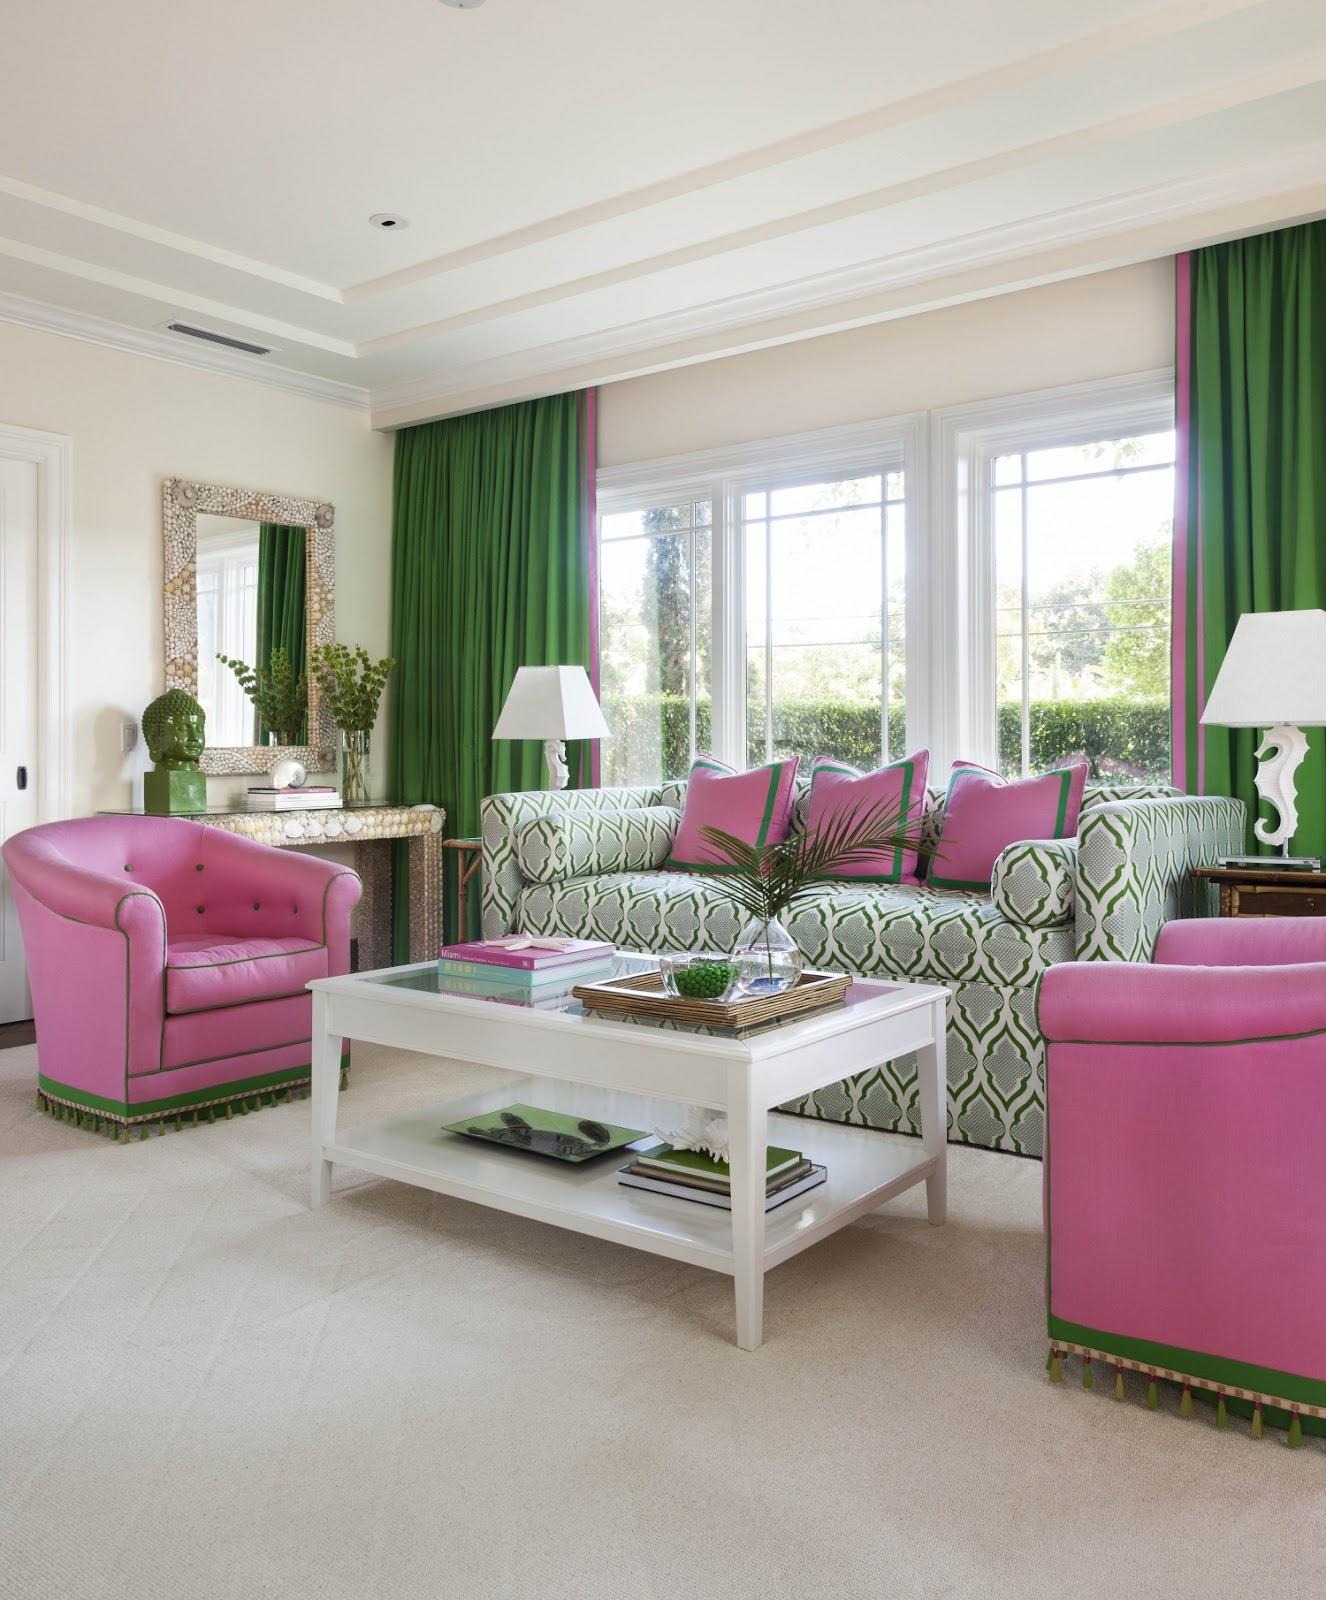 Preppy Bedroom Ideas Coastal Style Pink Amp Green Preppy Style